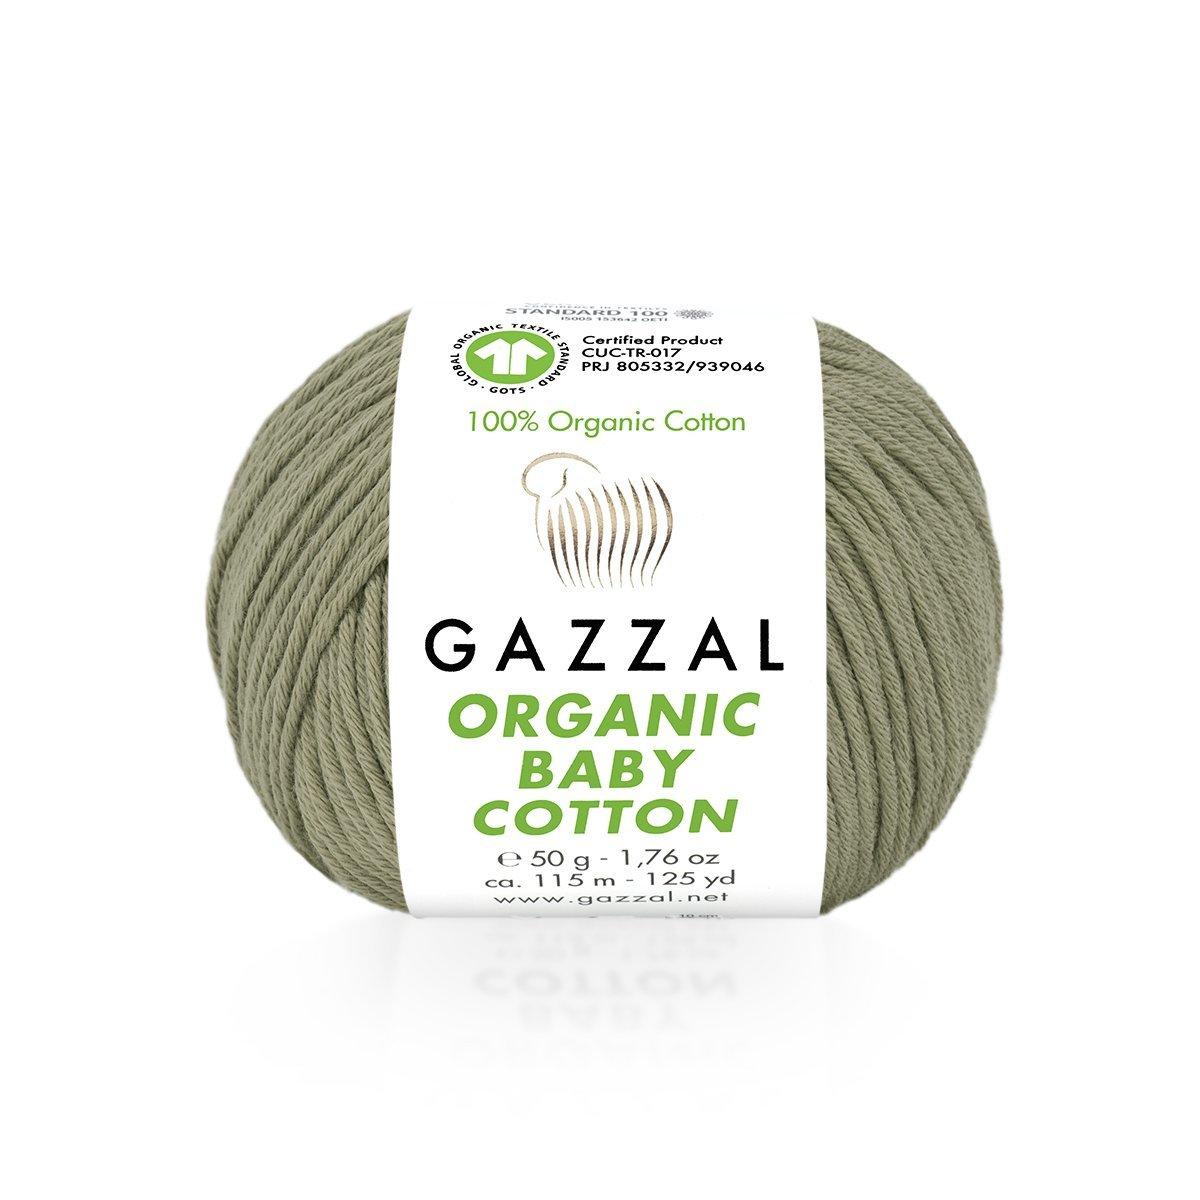 Пряжа Gazzal Organic Baby Cotton 431 оливковый